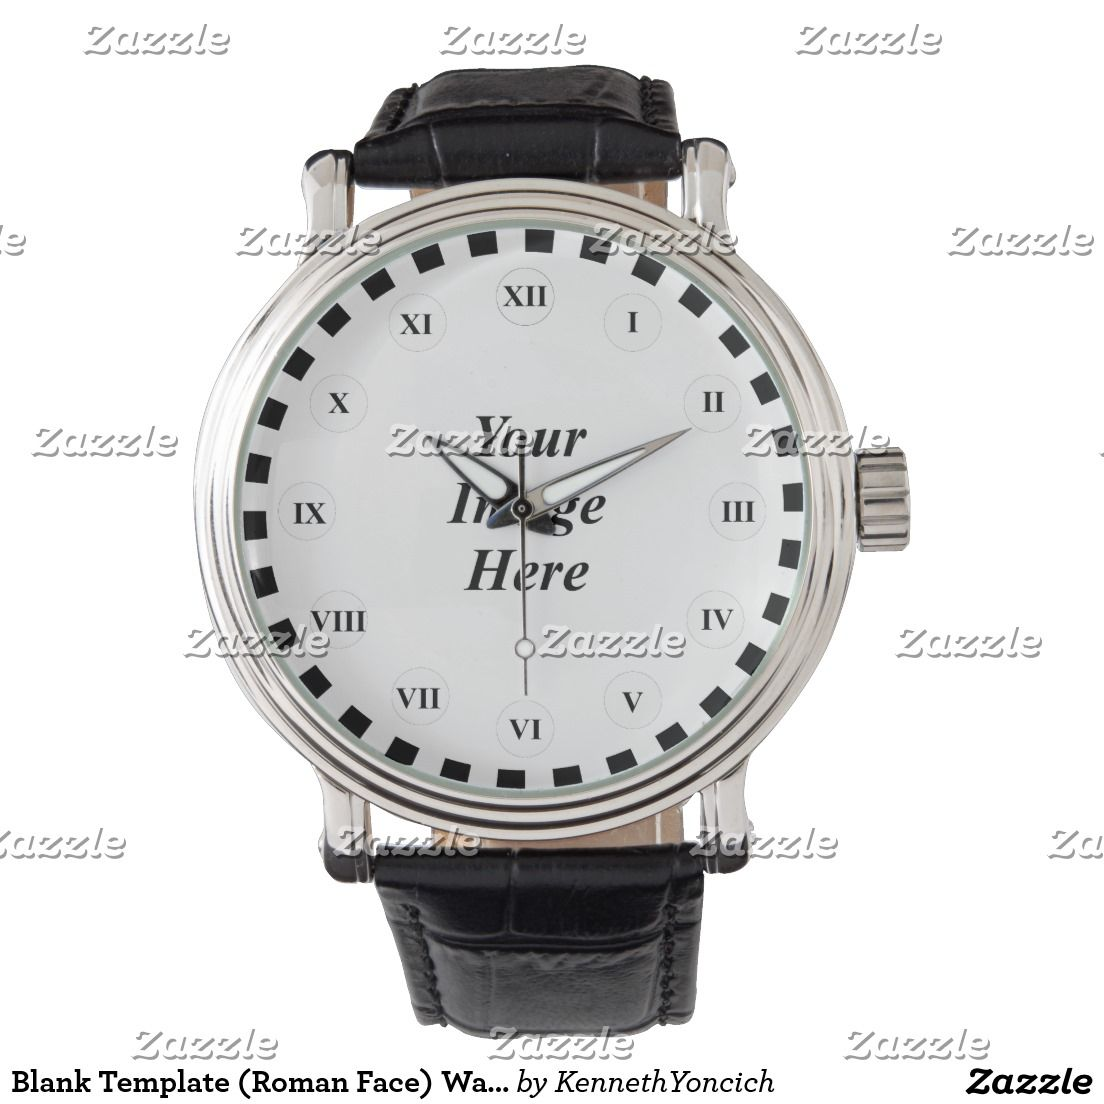 Blank Template (Roman Face) Watch | Stuff SOLD on Zazzle | Pinterest